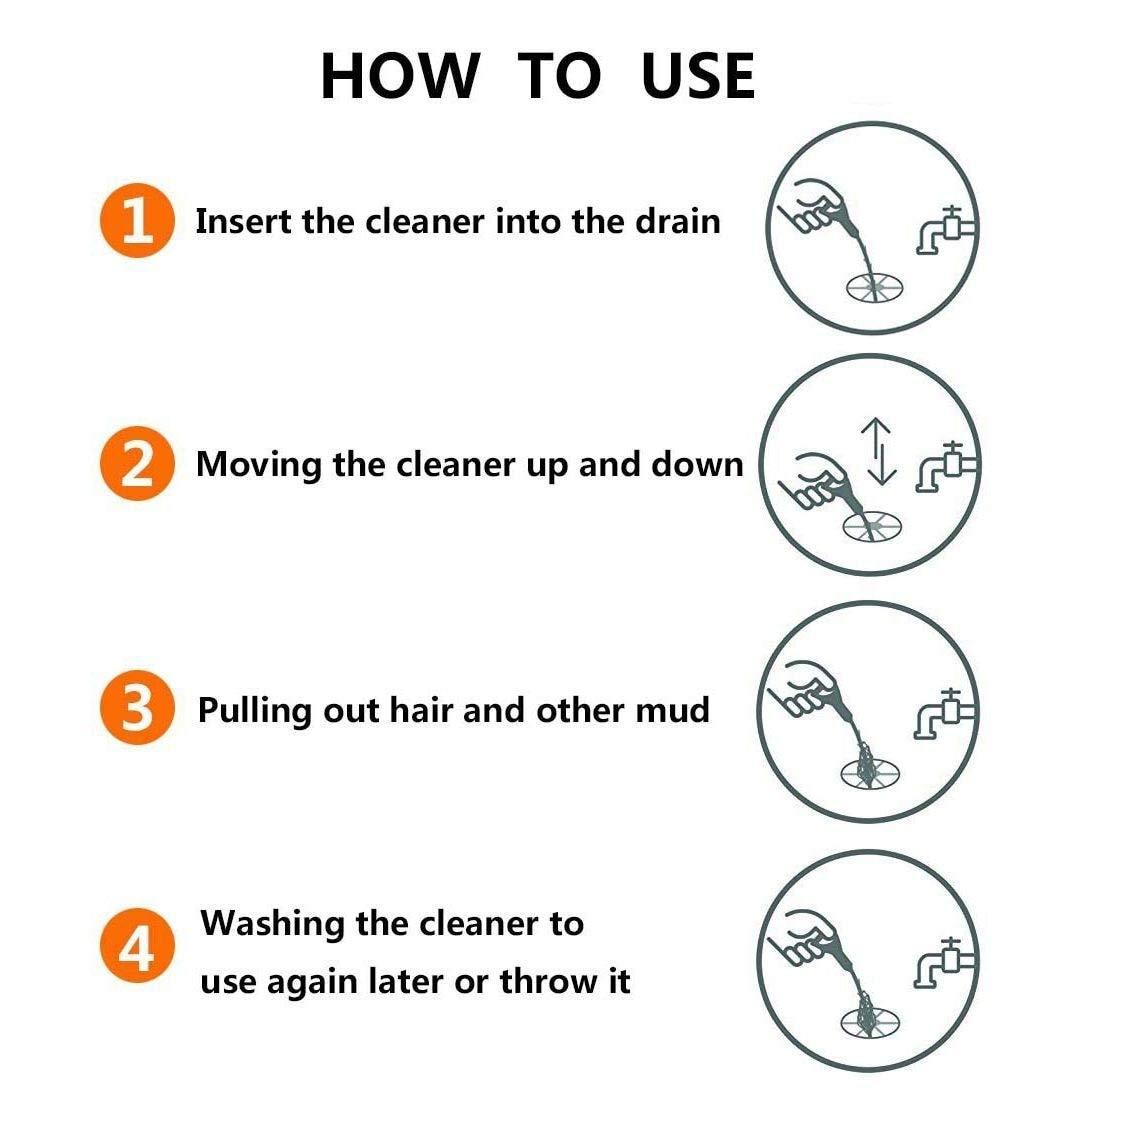 Tube Drain Cleaning JPISABB Drain Snake Clog Remover Drain Snake,Drain Snake Hair Drain Clog Tool Snake Drain Relief Cleaner Tool for Sink